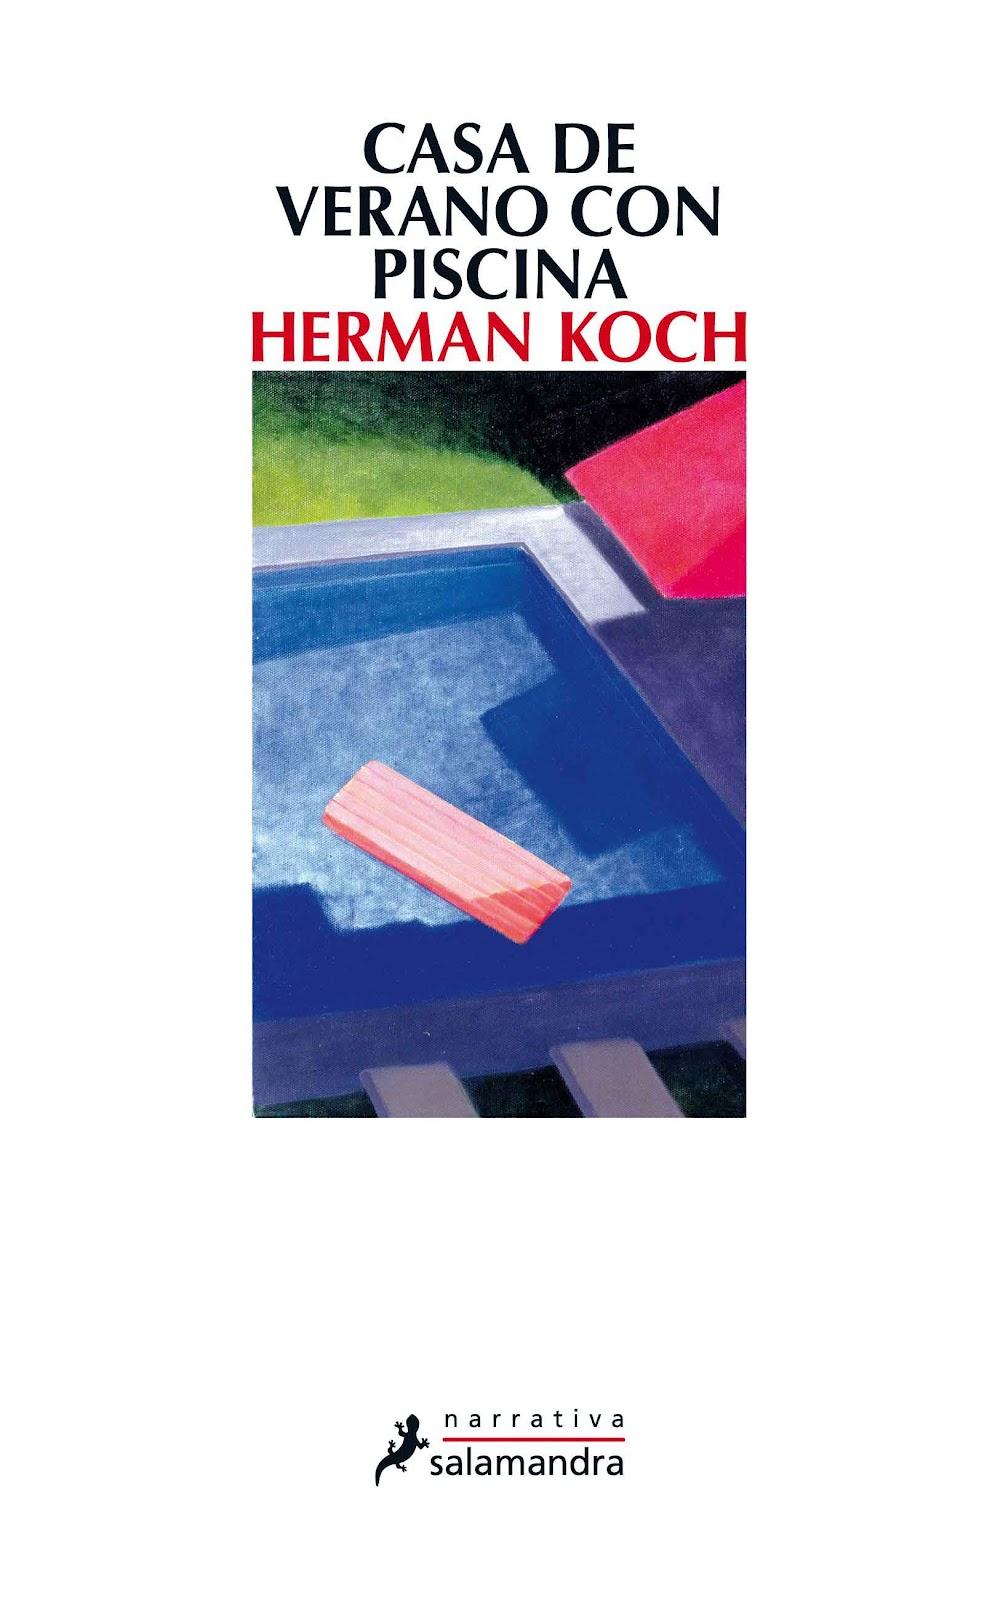 Books co la abuela lola for Casas de alquiler de verano con piscina